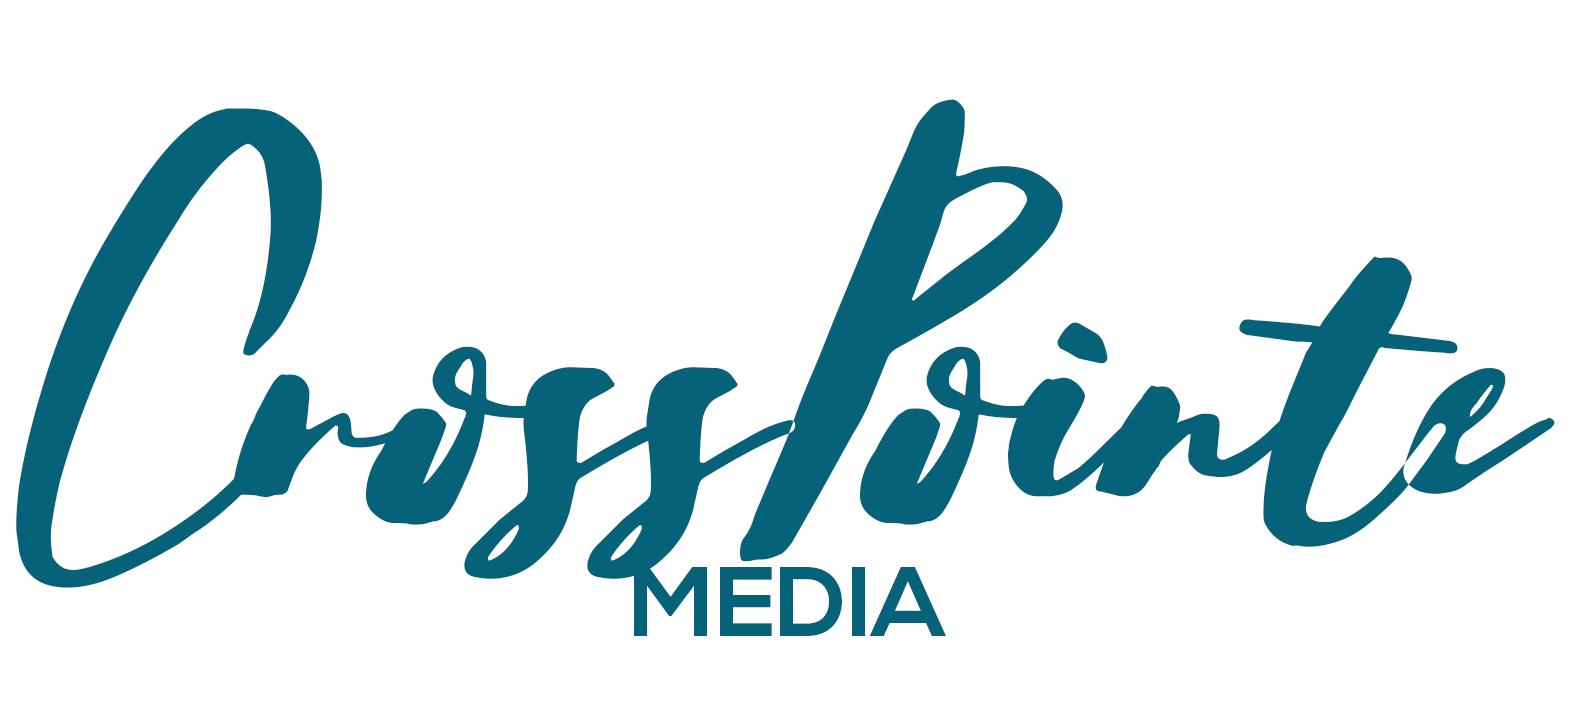 CrossPointe Media